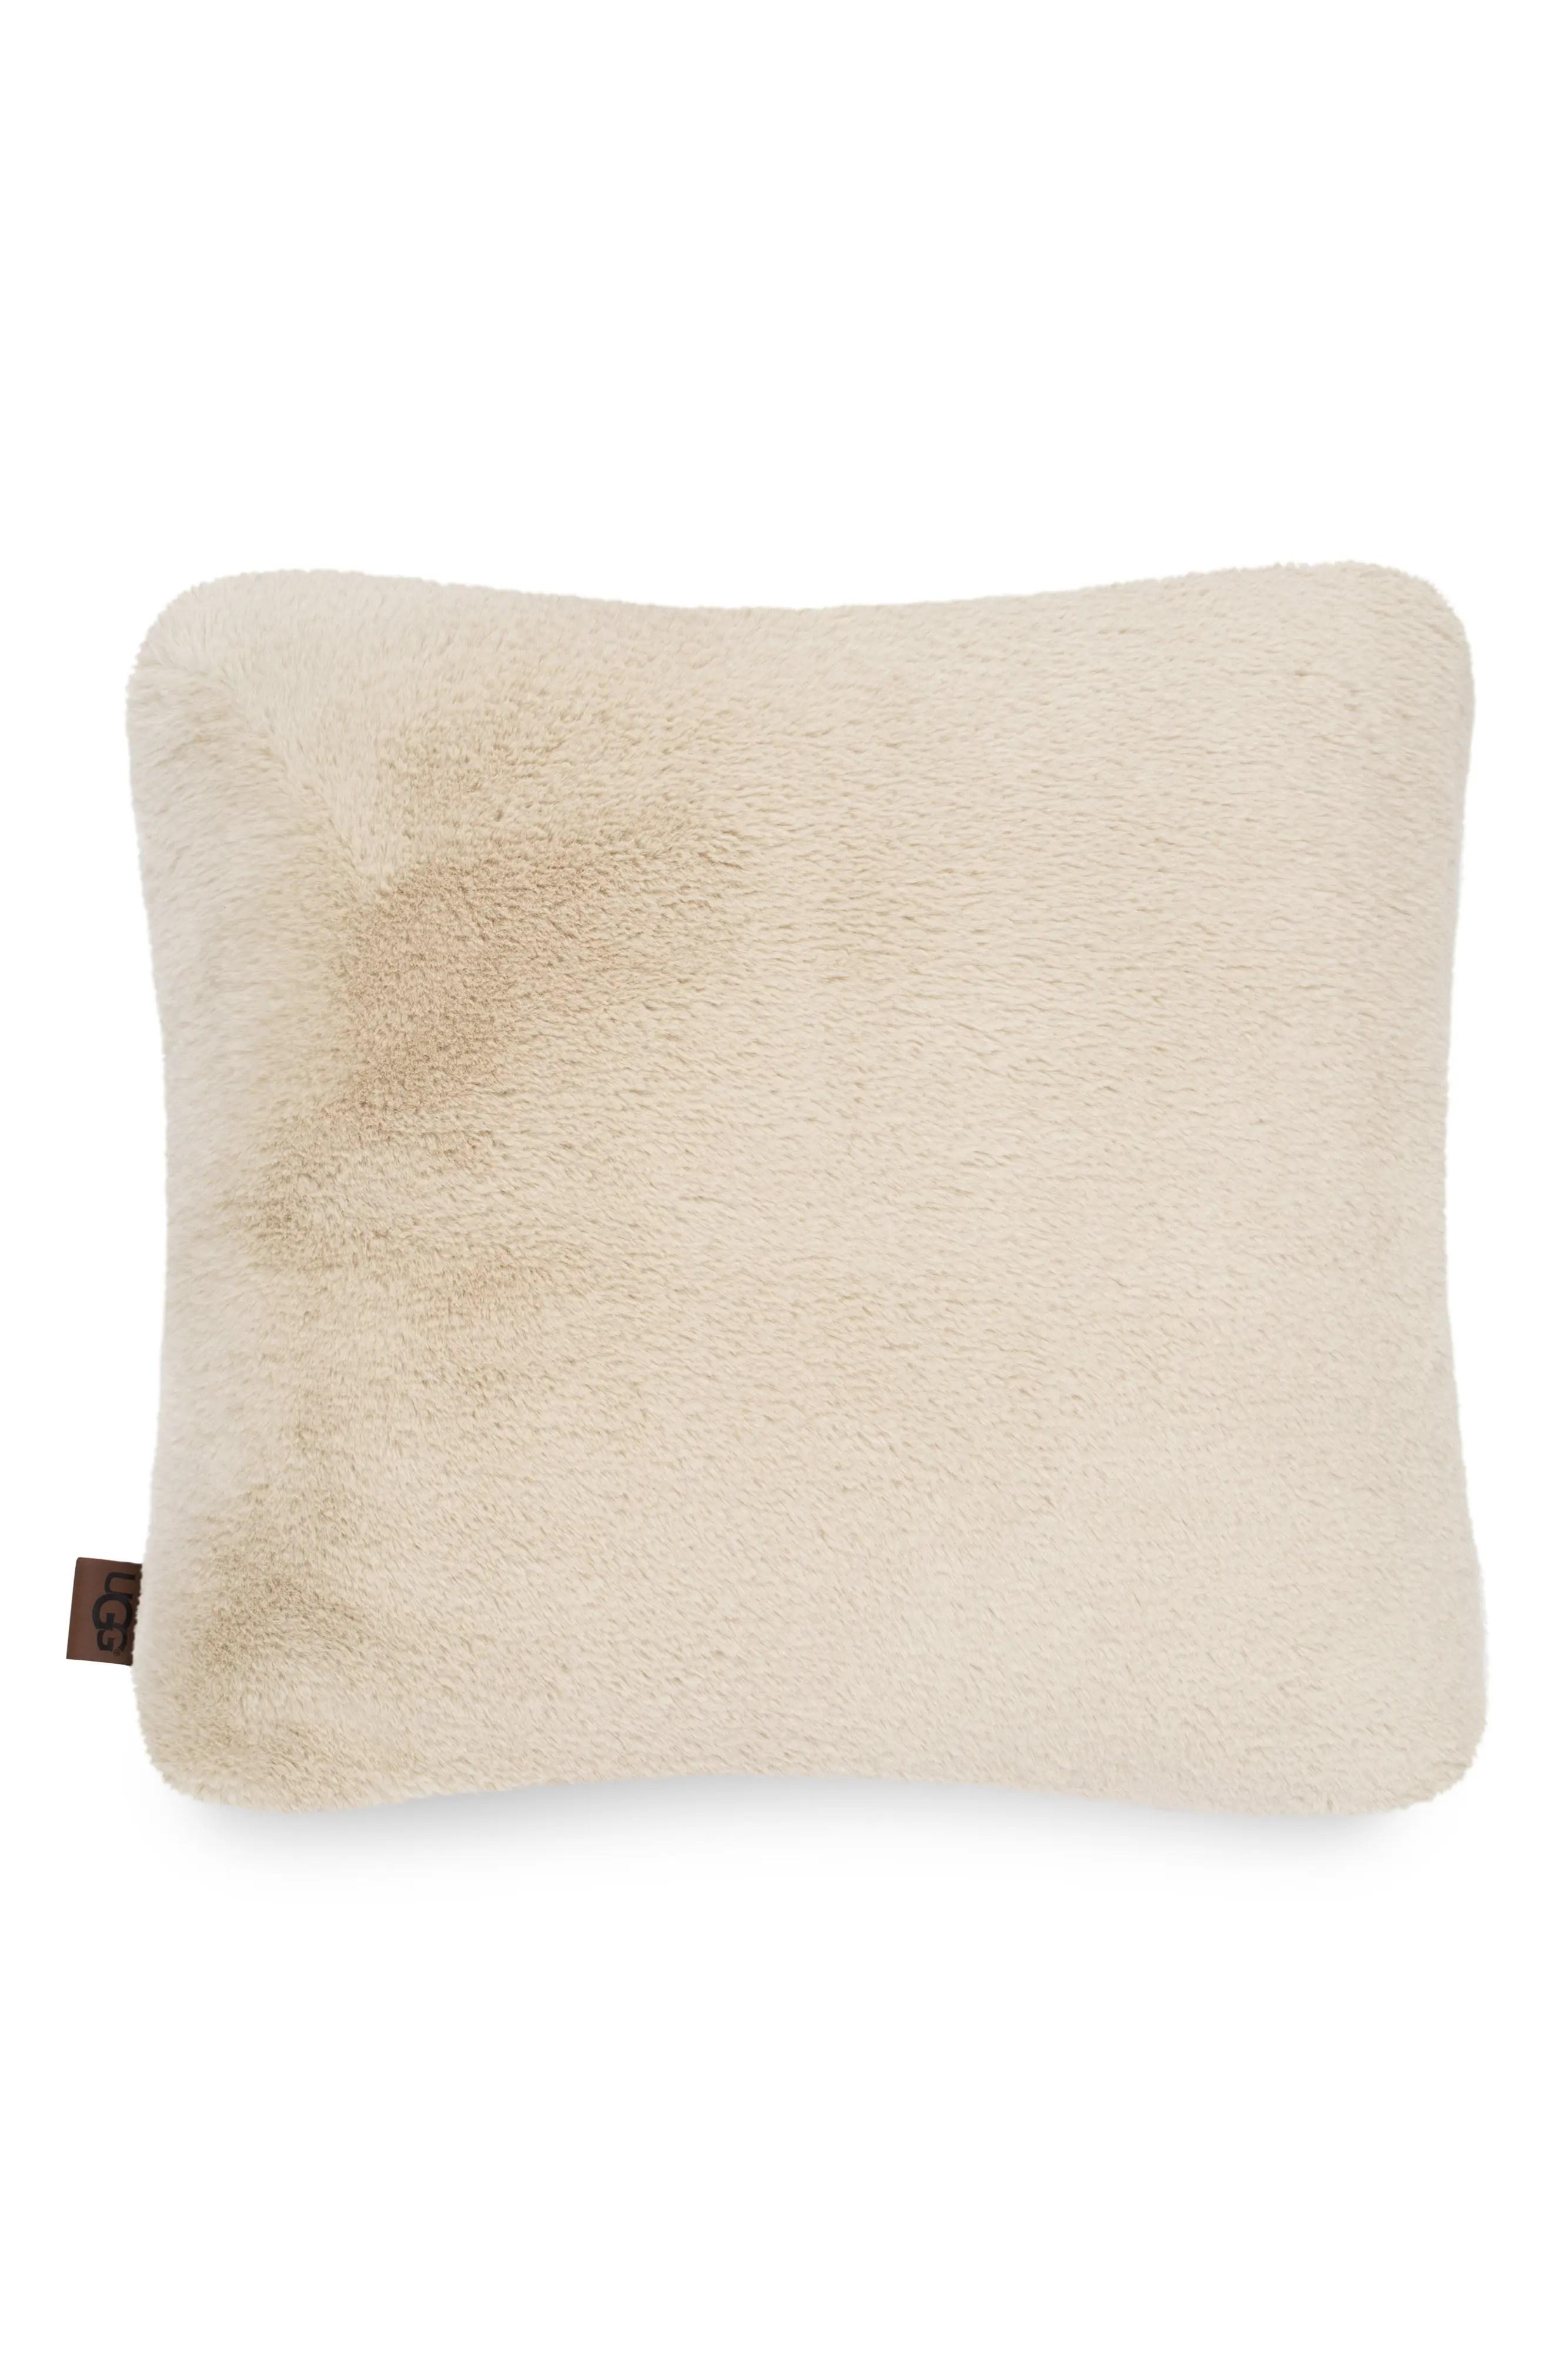 ugg lumbar pillow online